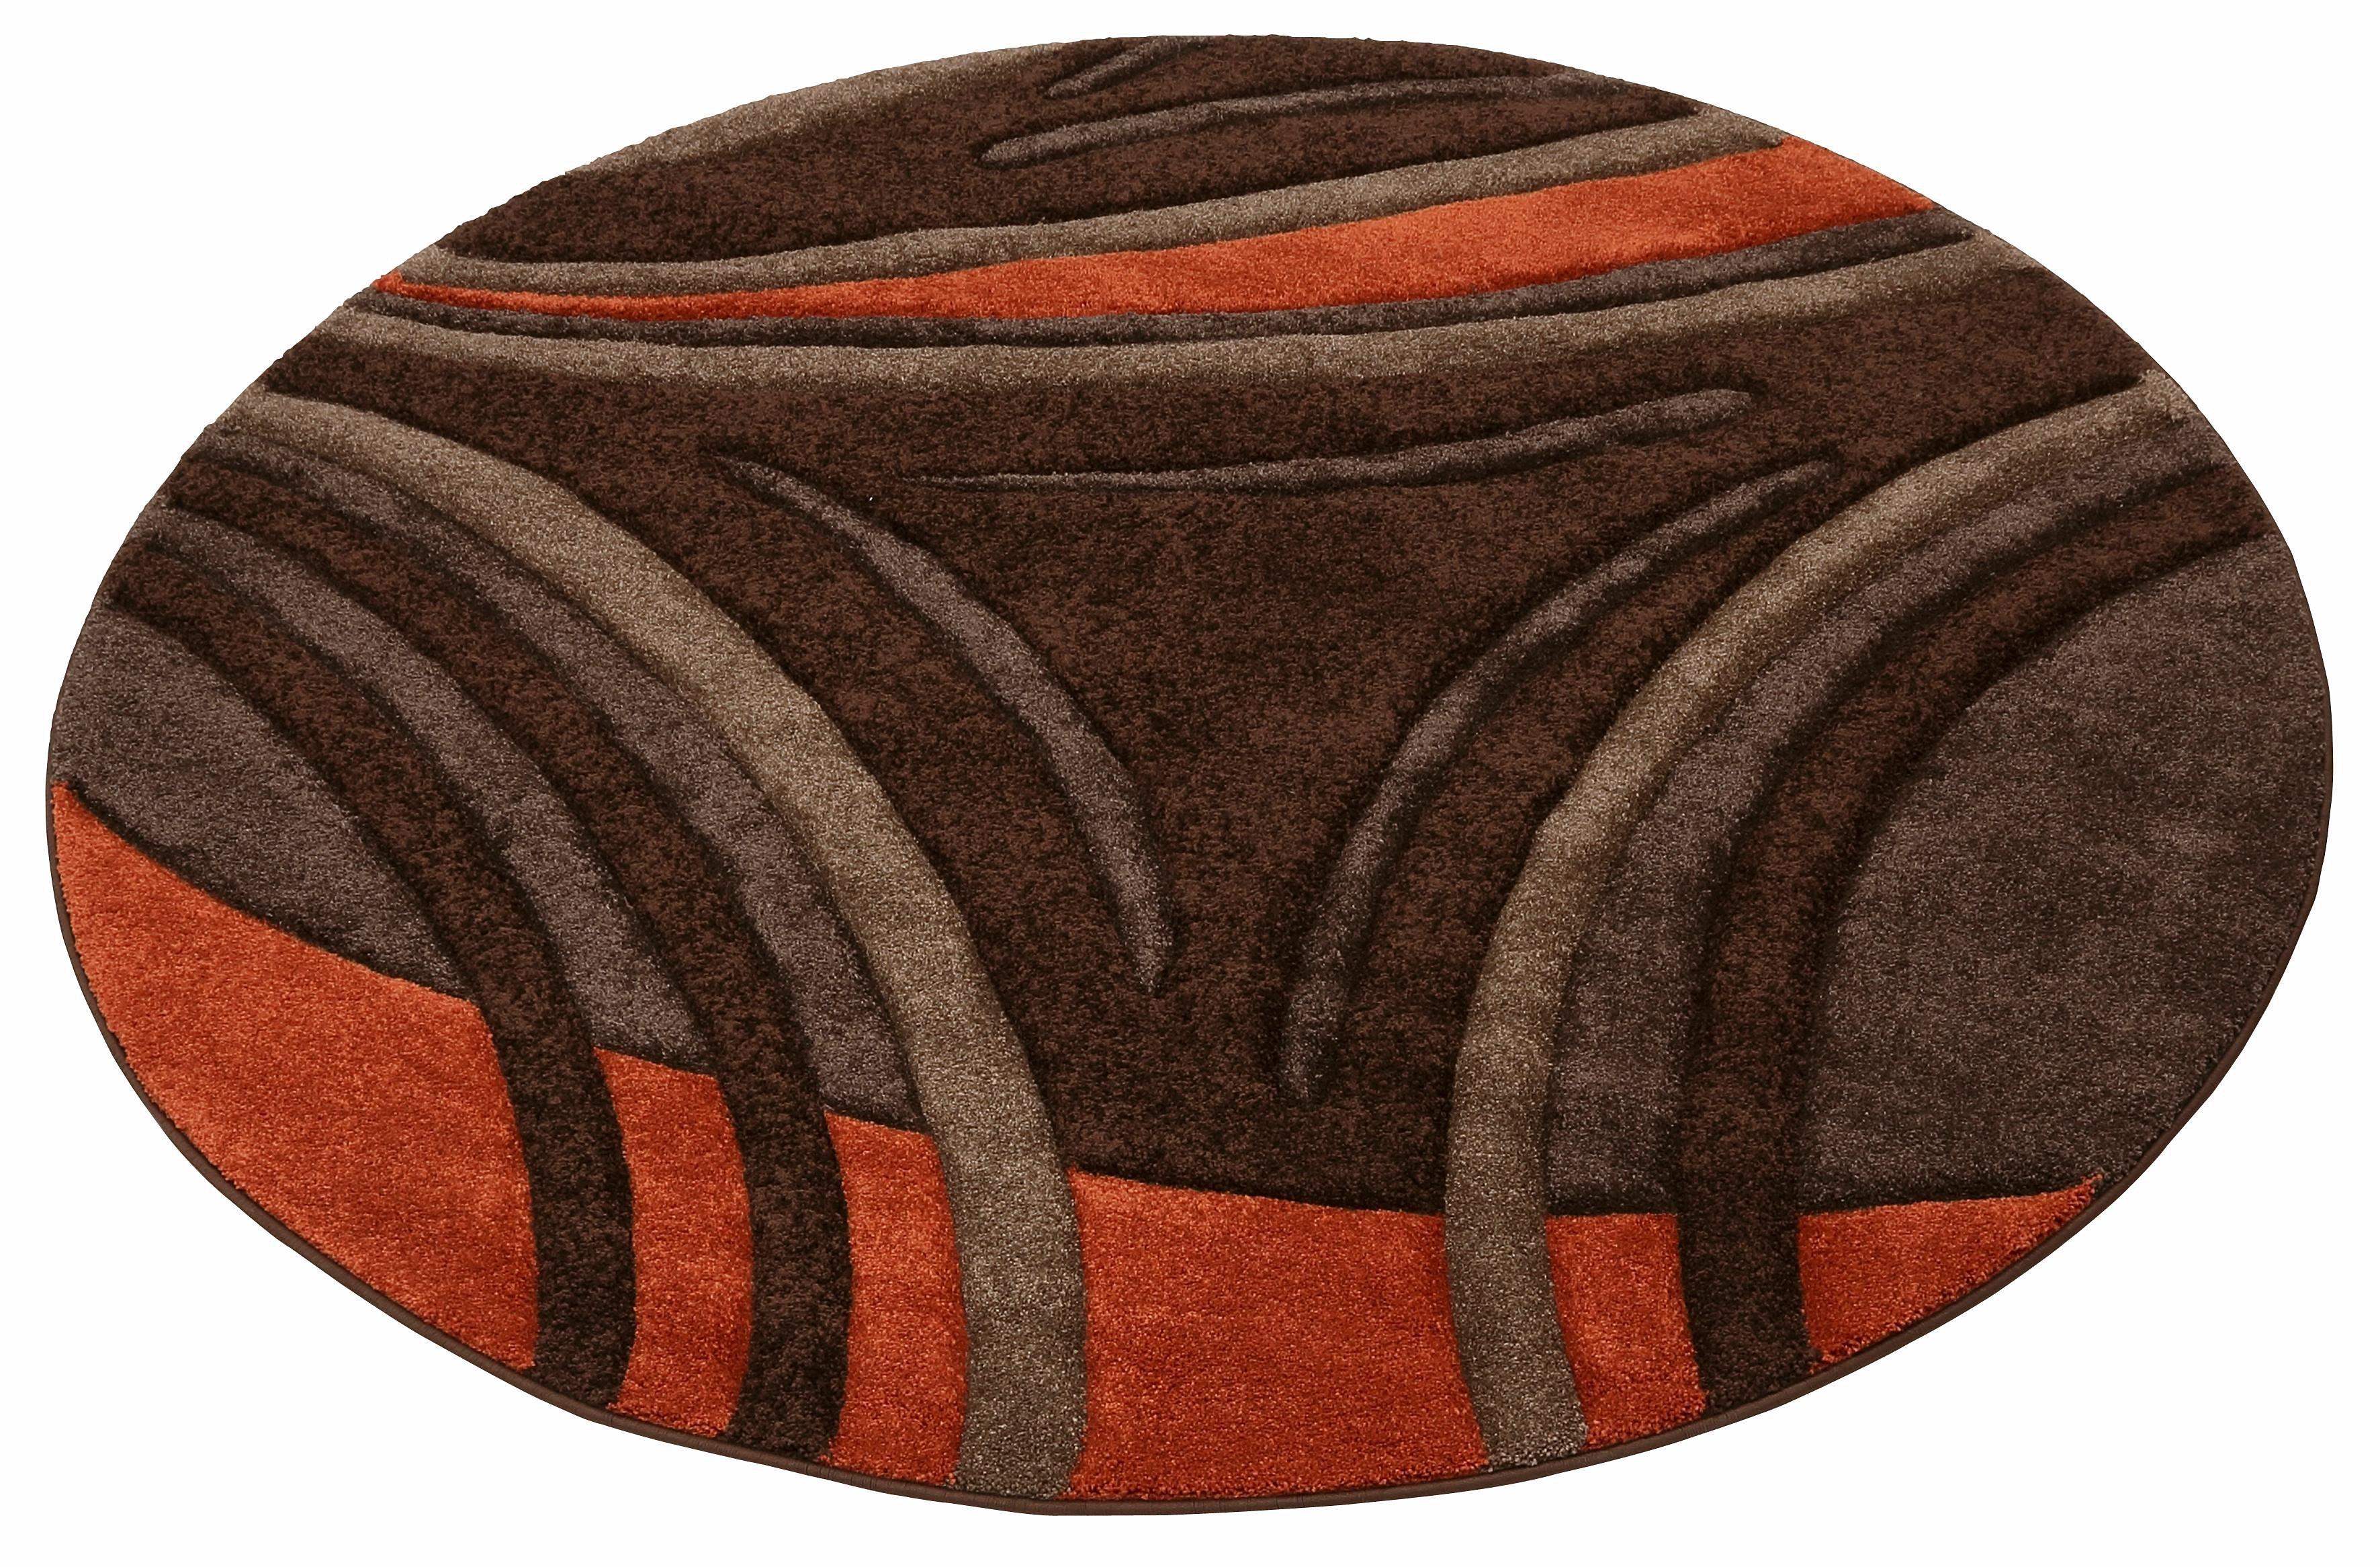 teppich david my home rund h he 20 mm braun 190 cm. Black Bedroom Furniture Sets. Home Design Ideas